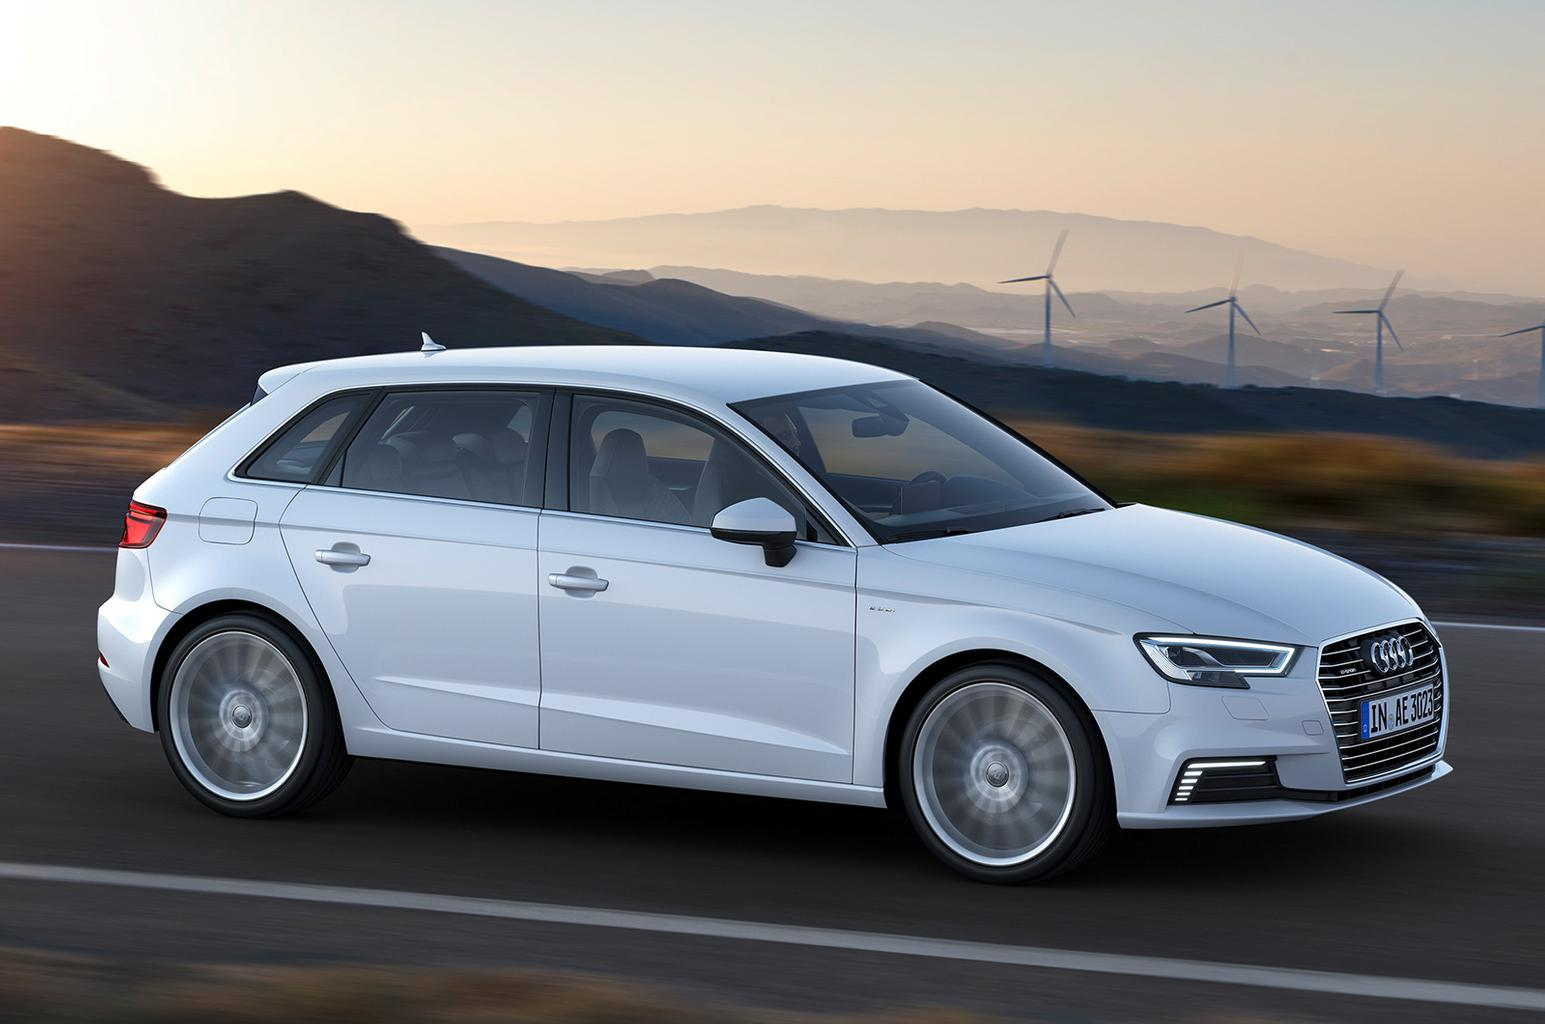 Best and worst hybrid cars 2018